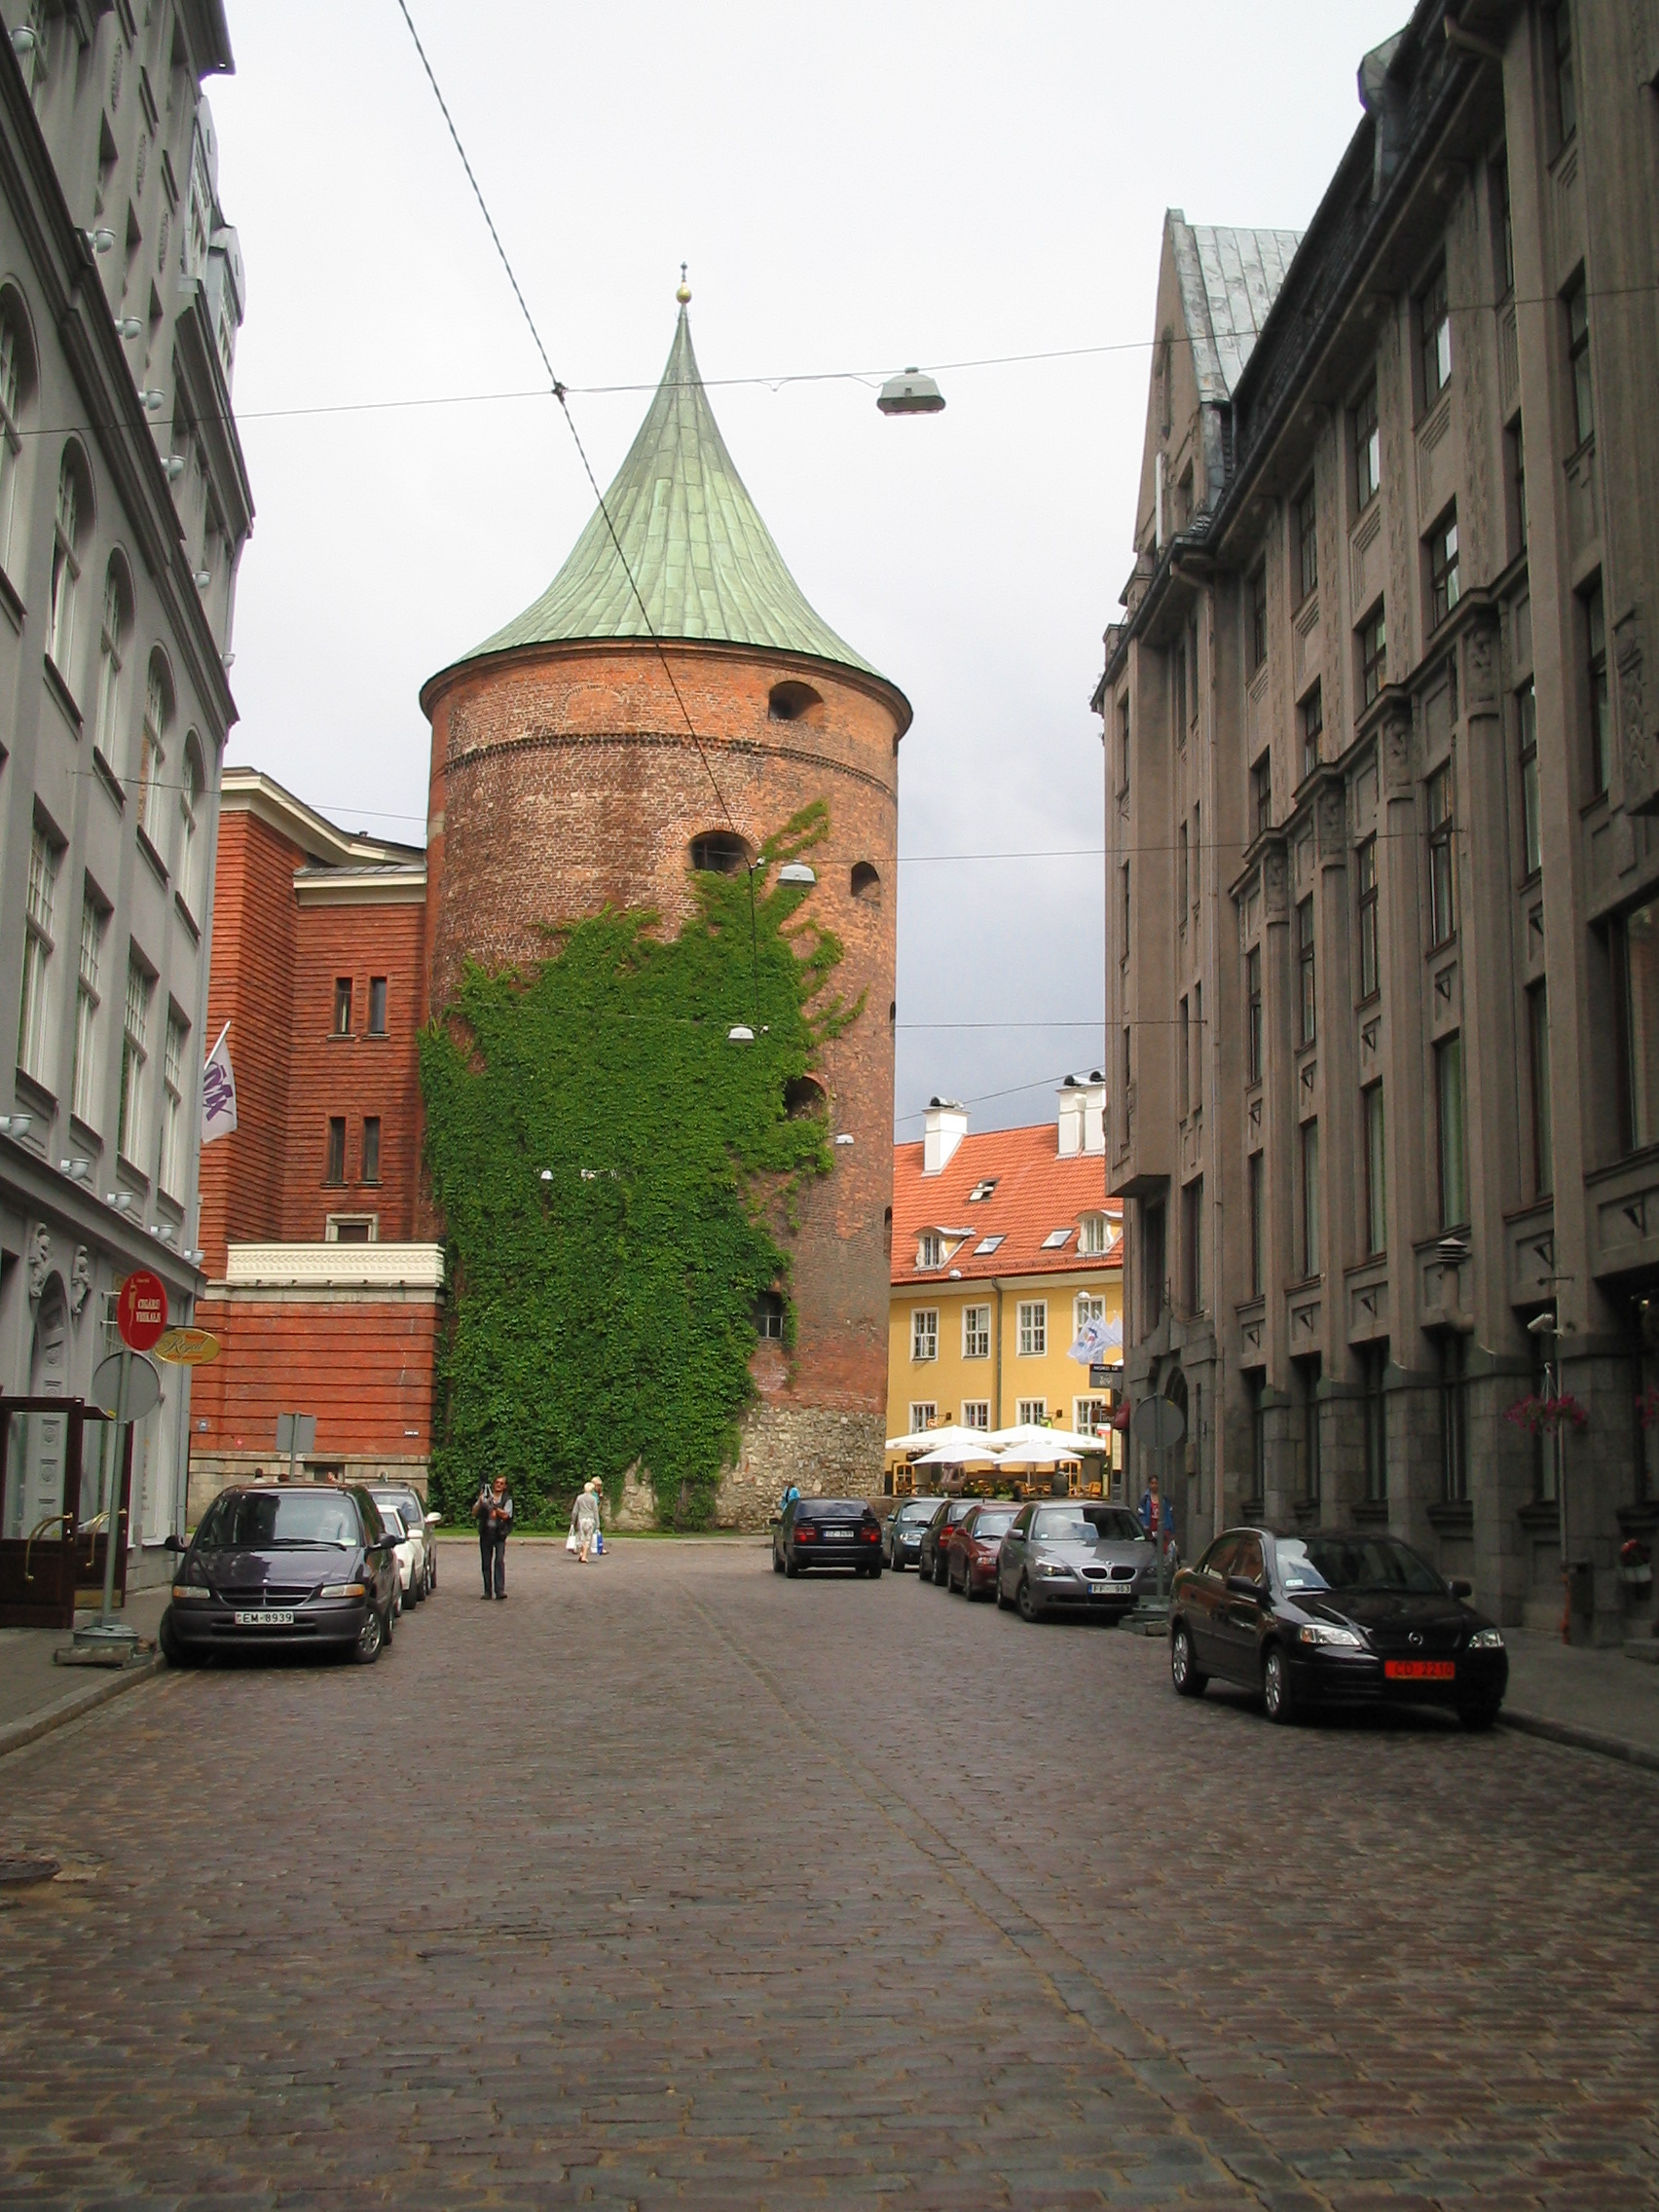 File:Riga Powder Tower.JPG - Wikimedia Commons